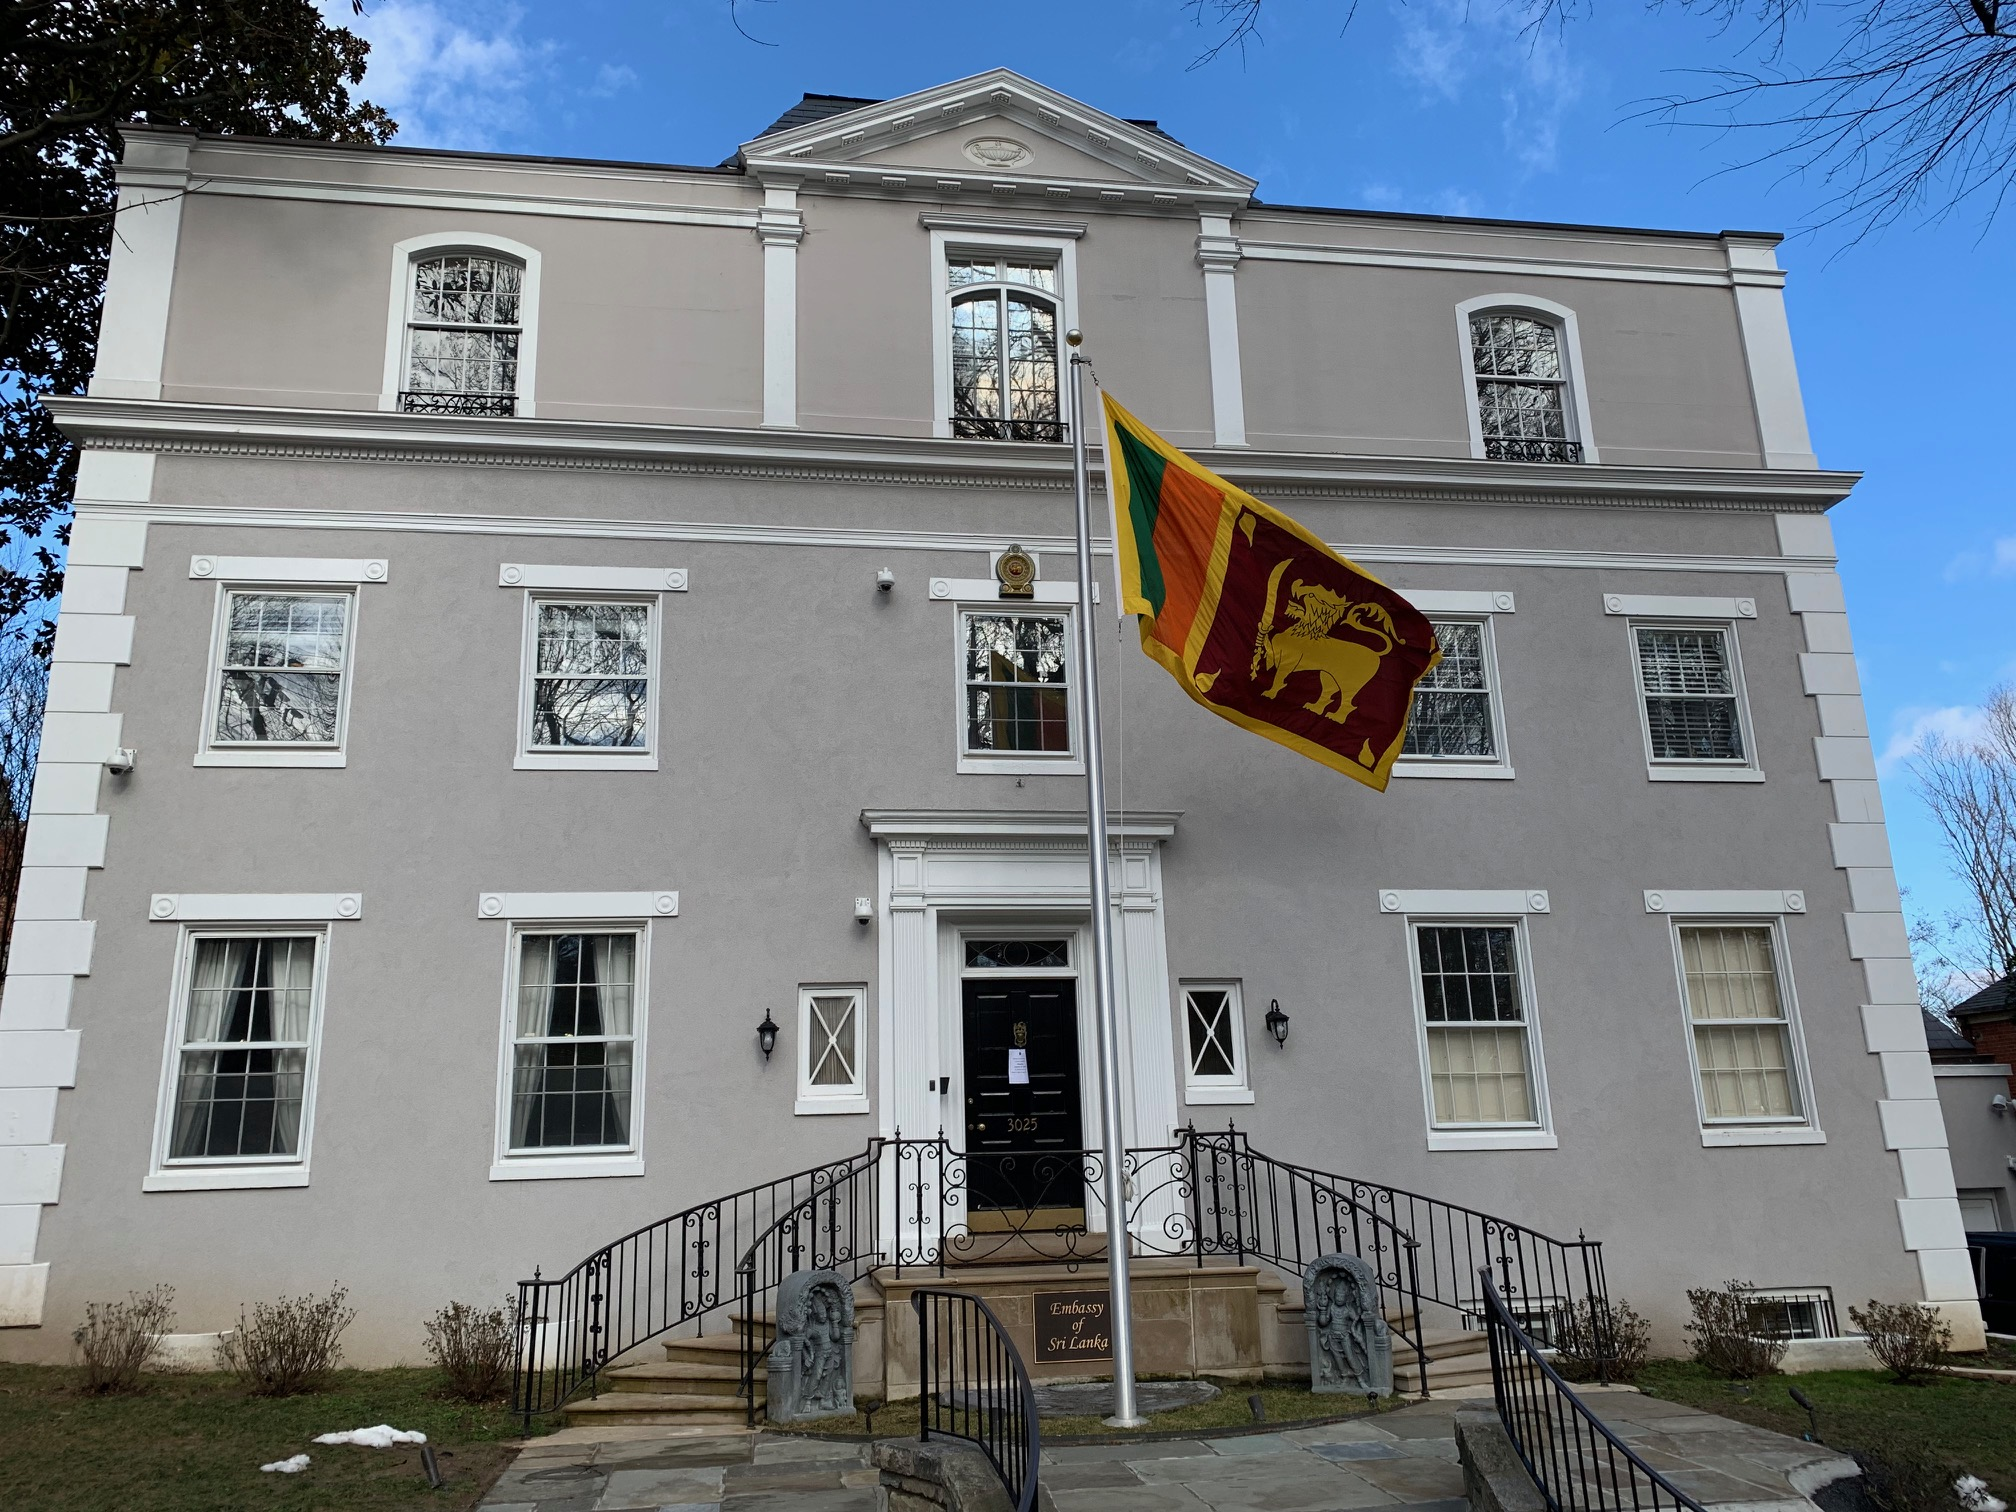 Real Estate & Homes For Sale Near The Embassy of Sri Lanka in Washington, DC. Artyom Shmatko Luxury Real Estate Agent